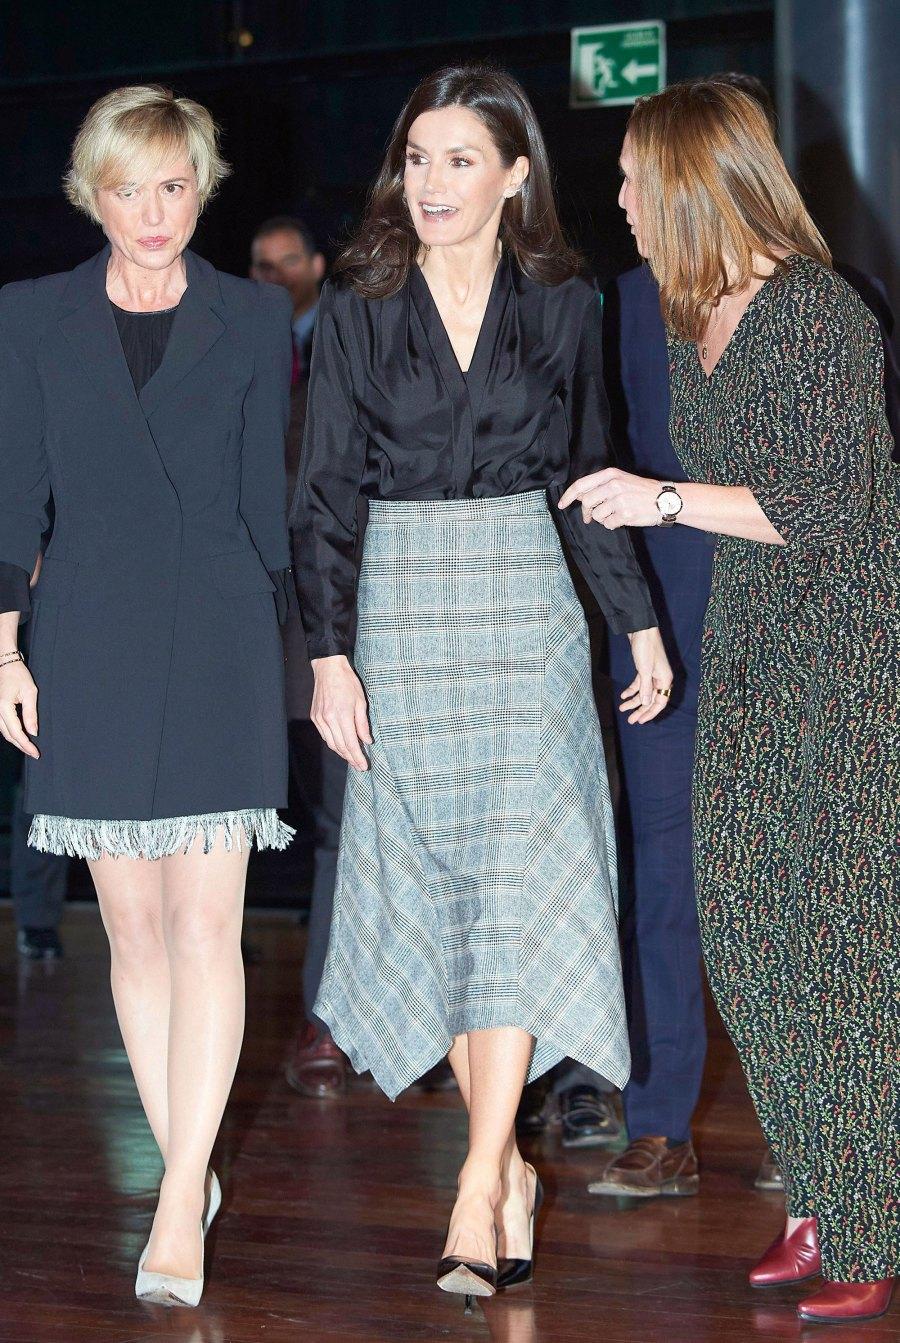 Queen Letizia Plaid Skirt February 11, 2020